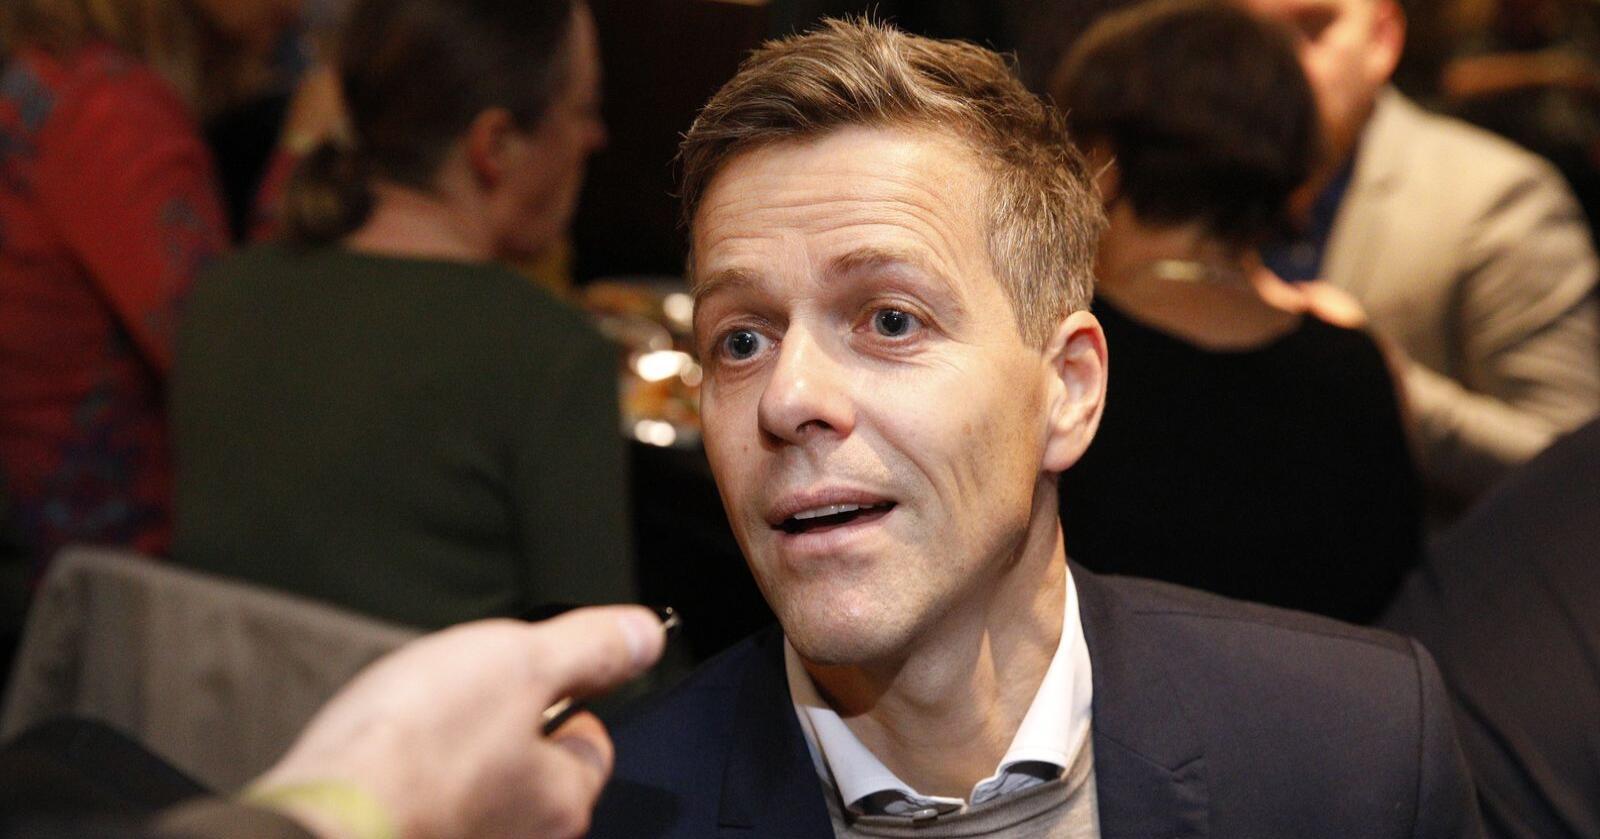 Oslo 20190909. Knut Arild Hareide under valgvaken til KrF på Røverstaden i Oslo.Foto: Audun Braastad / NTB scanpix